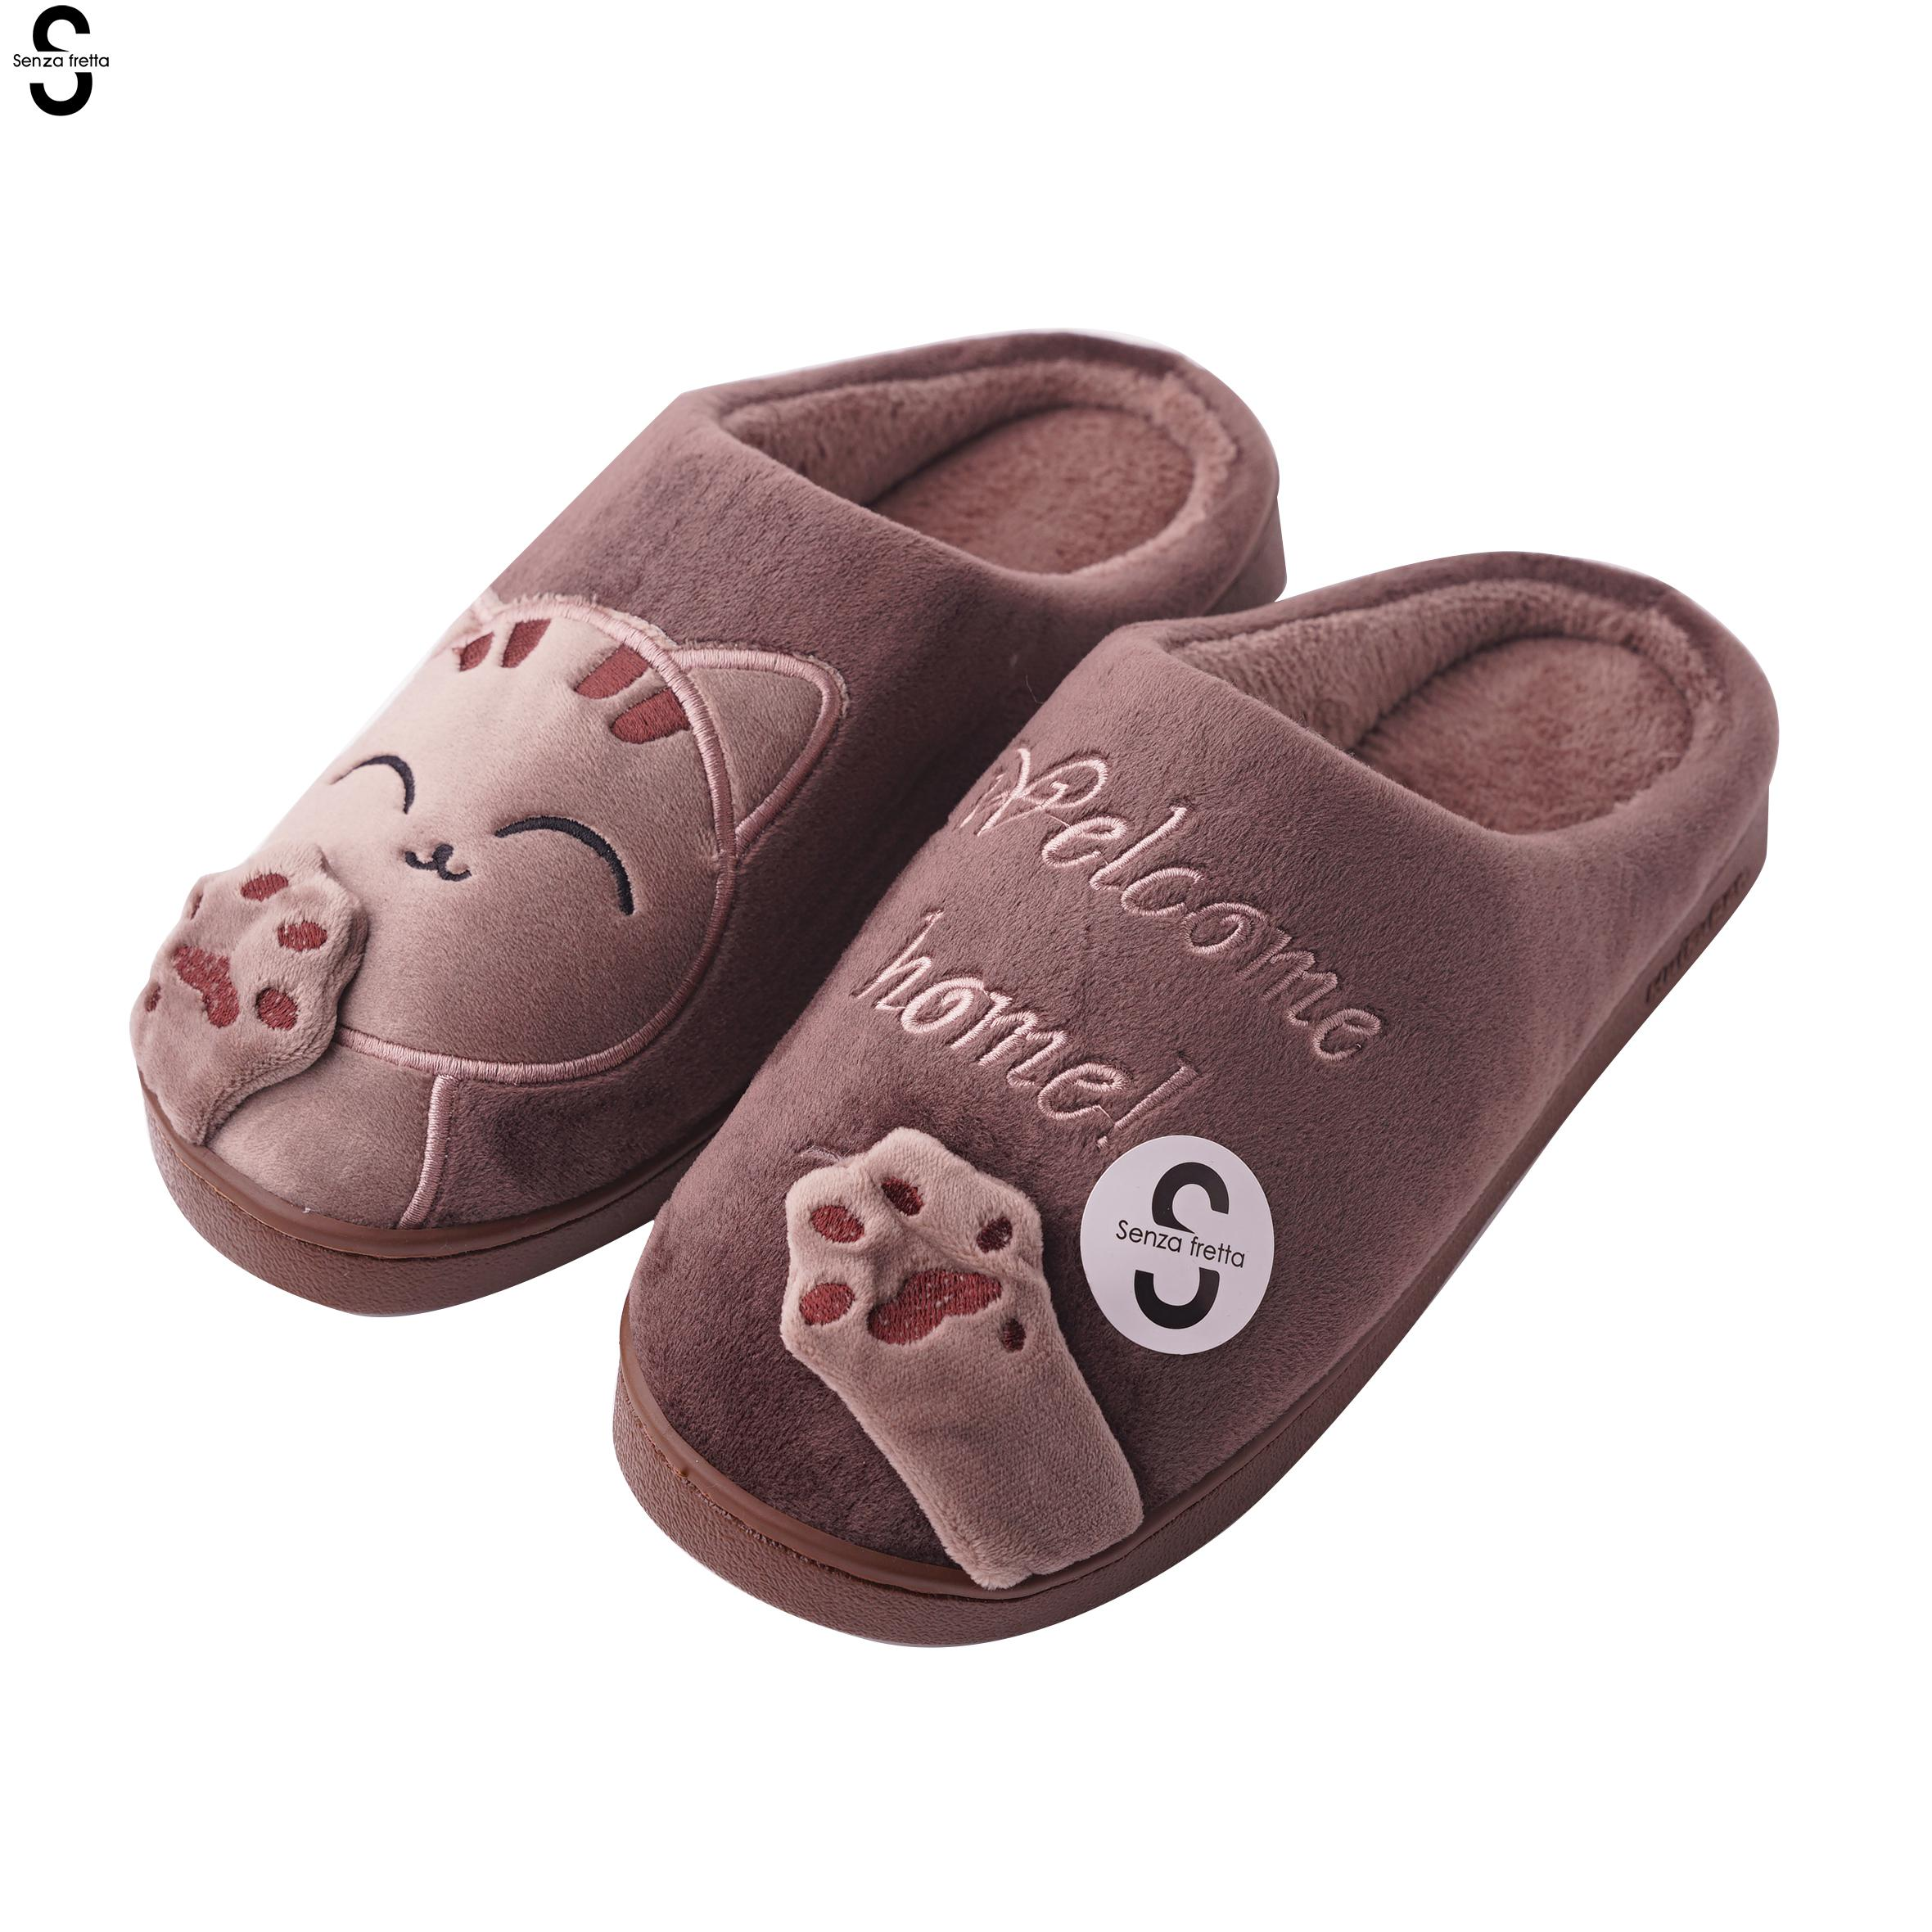 Senza Fretta Winter Men Slippers Cartoon Cat Couple Cotton Men Slippers Indoor Soft Thick Bottom Warm Slippers Couple Plus Size